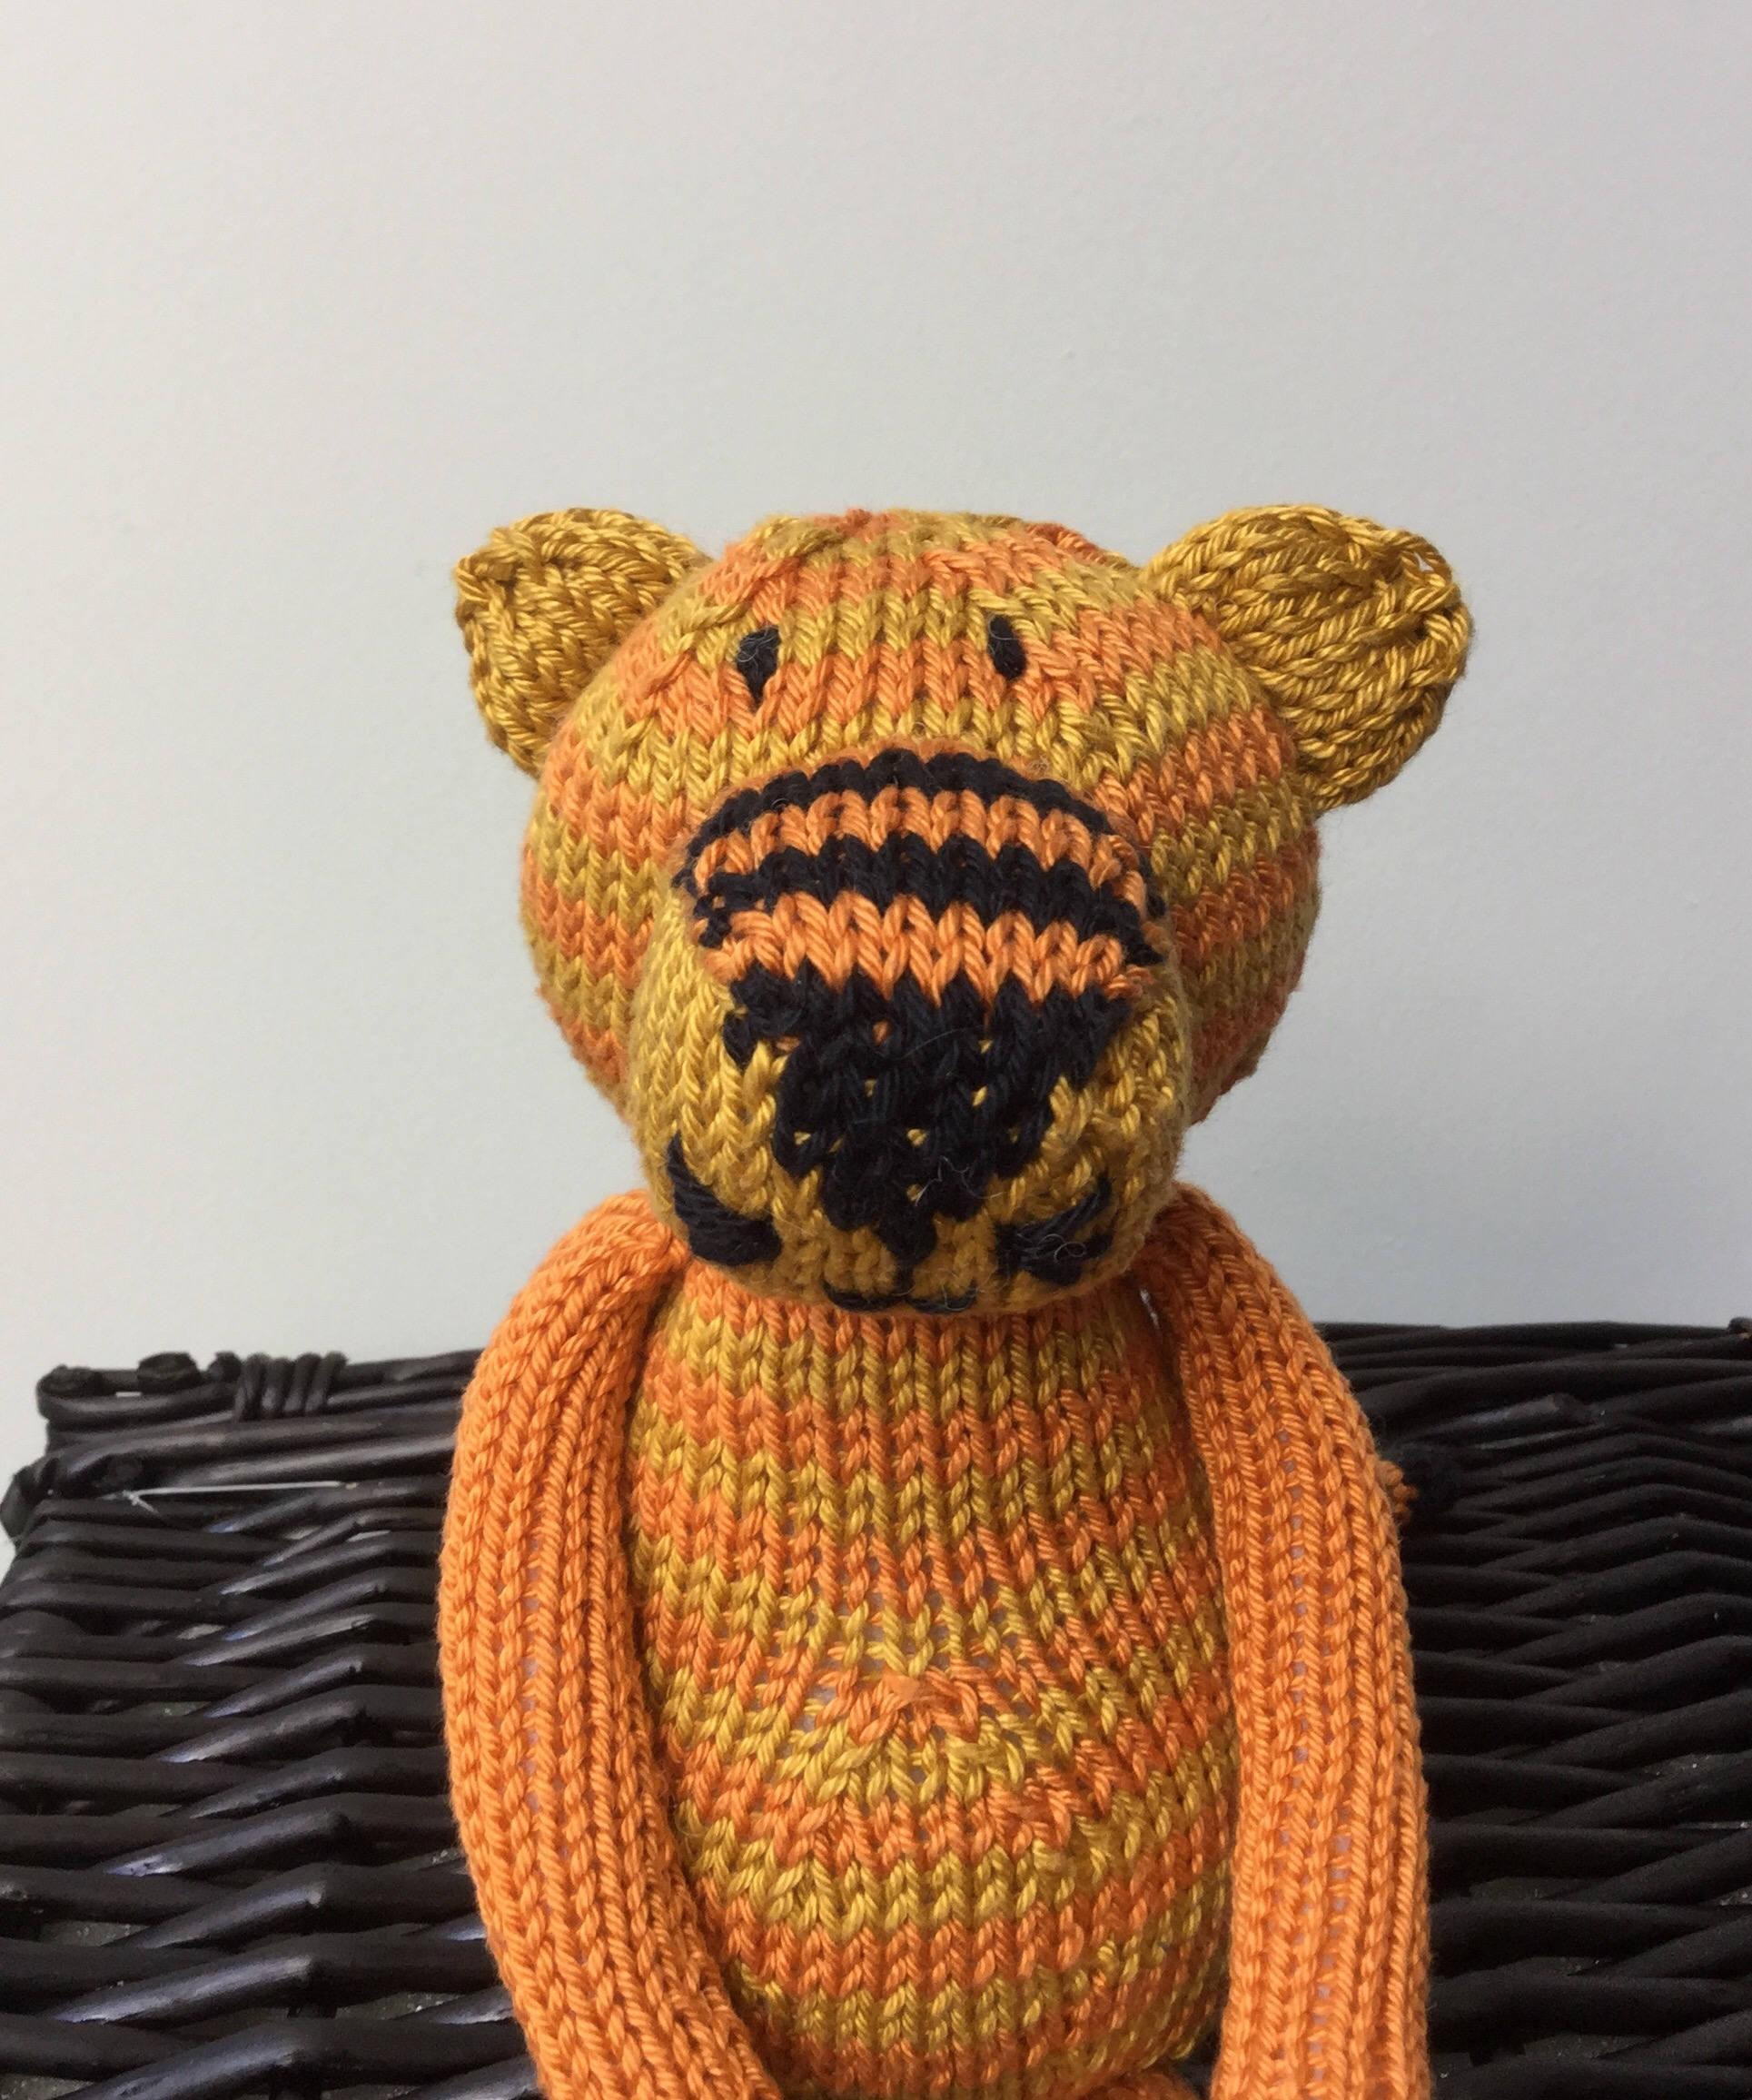 Hand knitted Tiger  Handmade Plush stuffed toyHand knitted and Hand EmbroideredSoft Knitted Novelty Toy Nursery Gift CUSTOM MADE